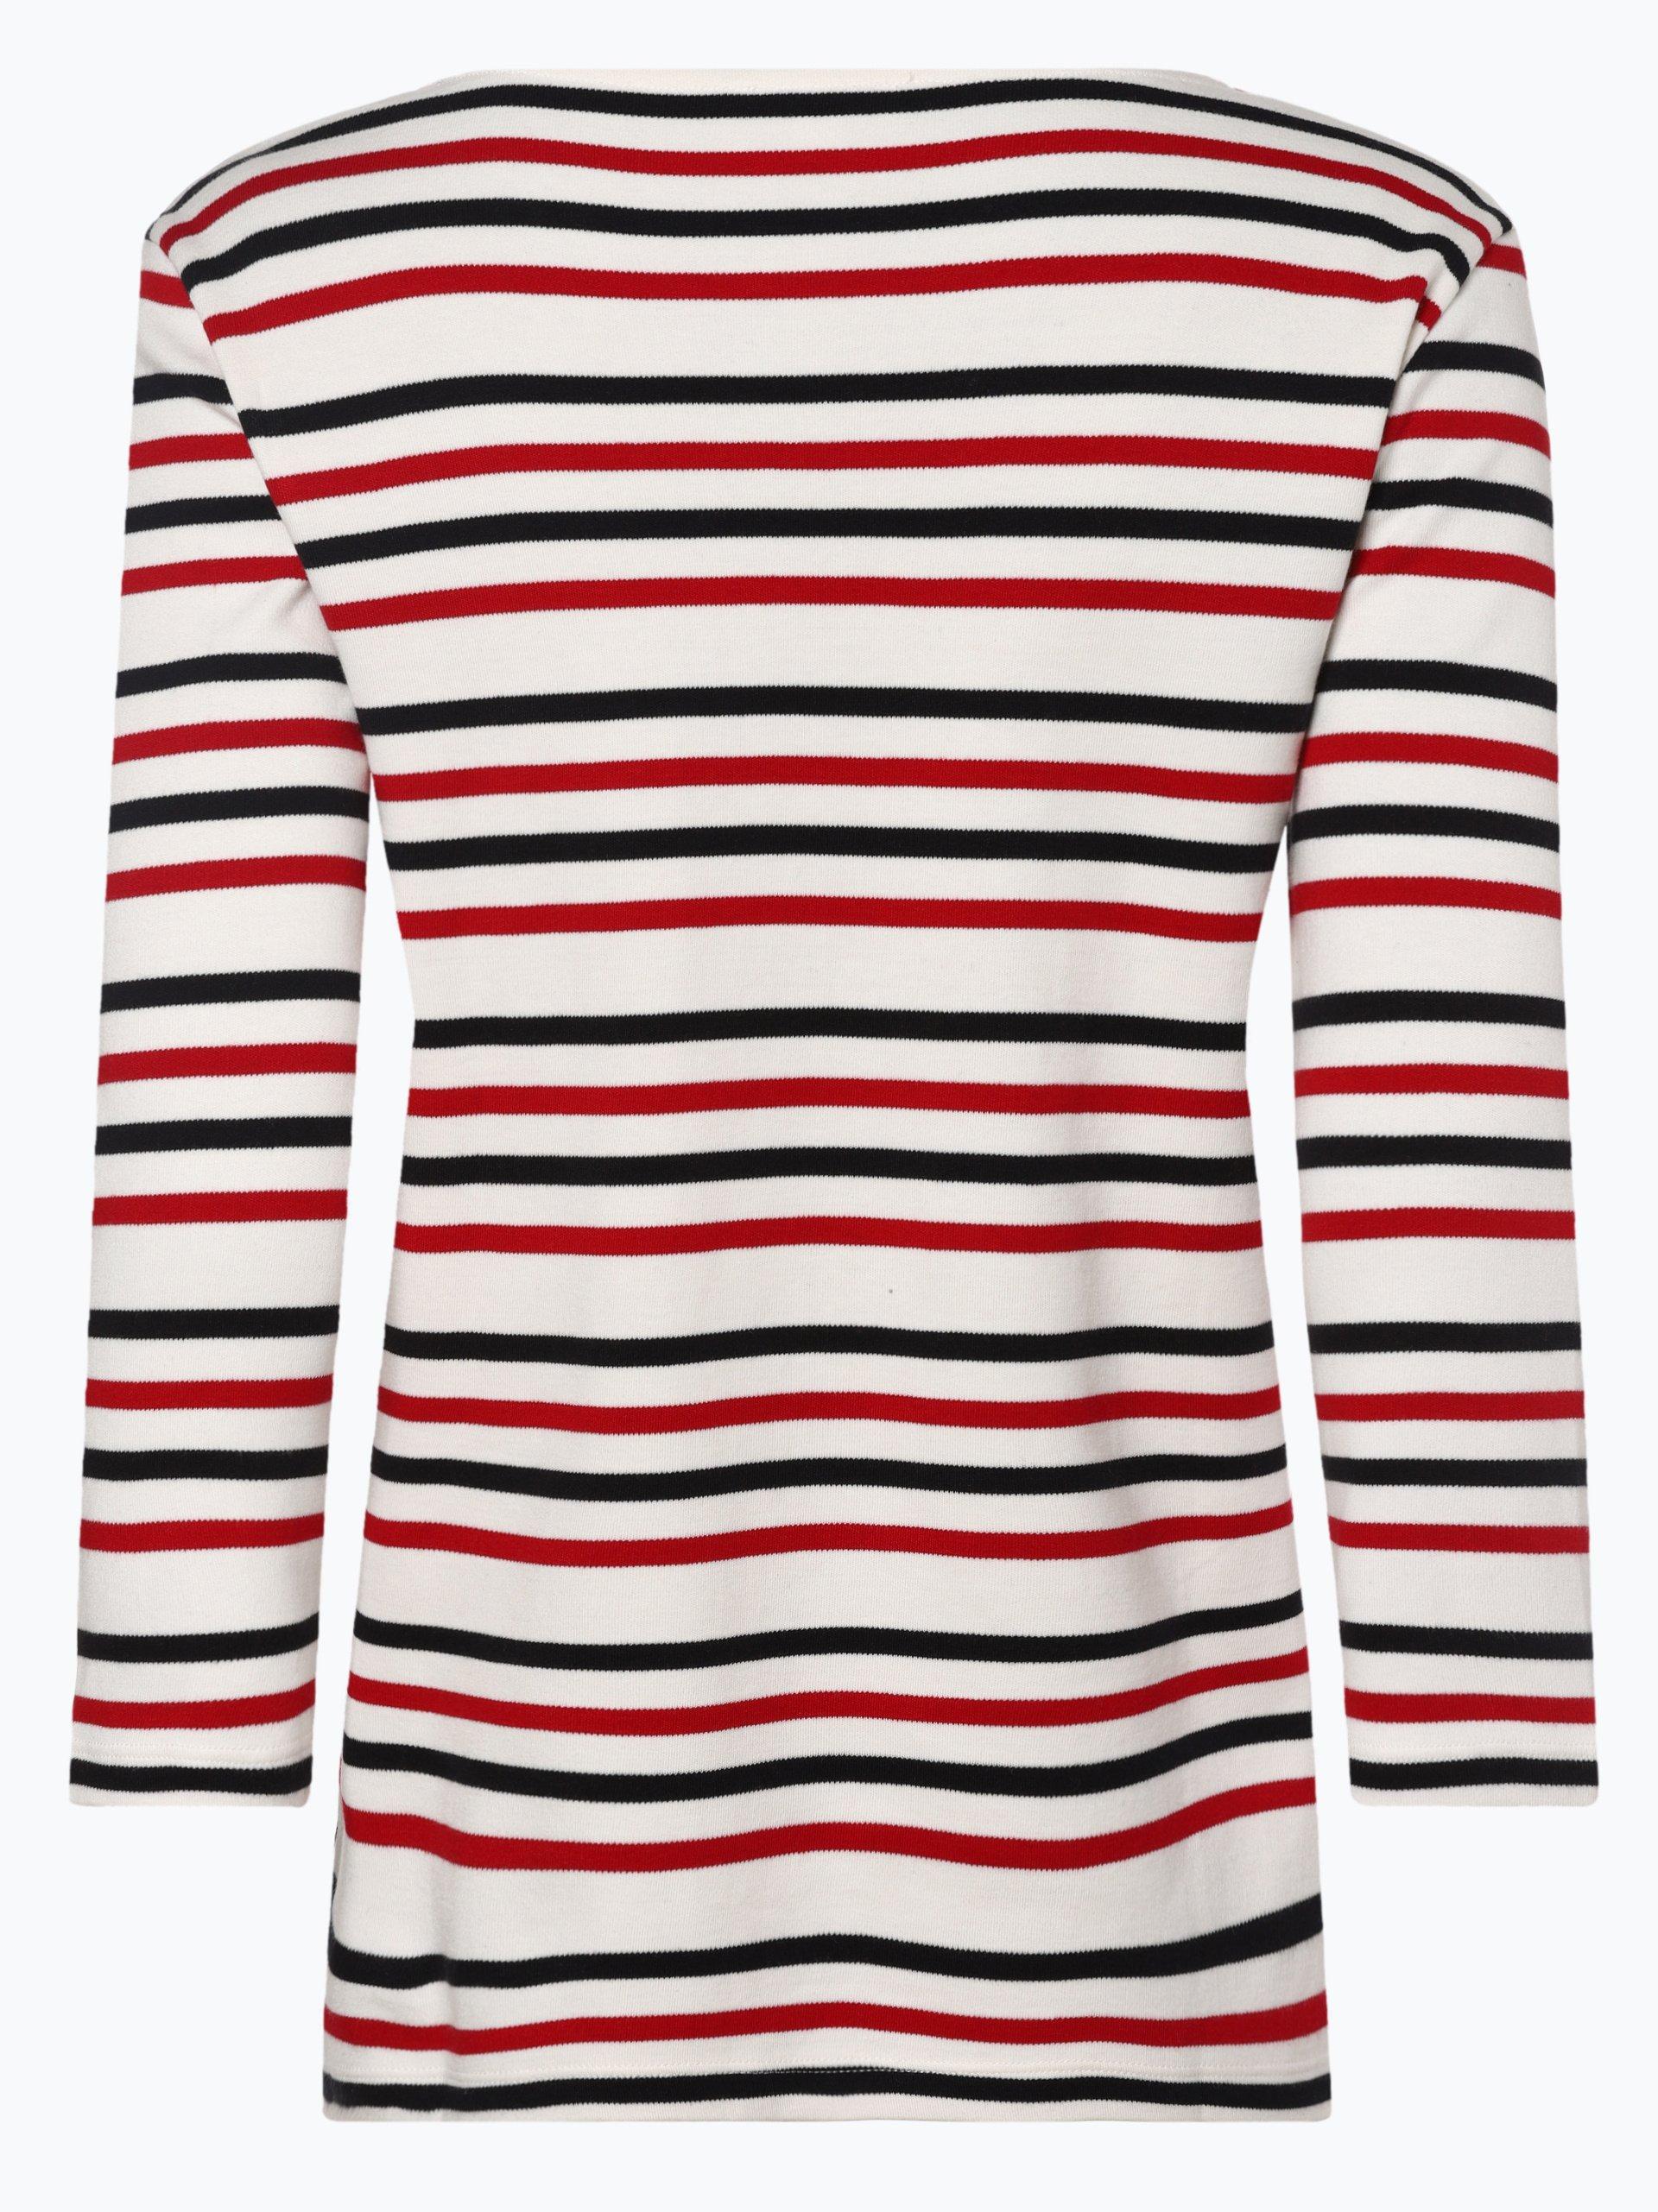 Marie Lund Damen Shirt